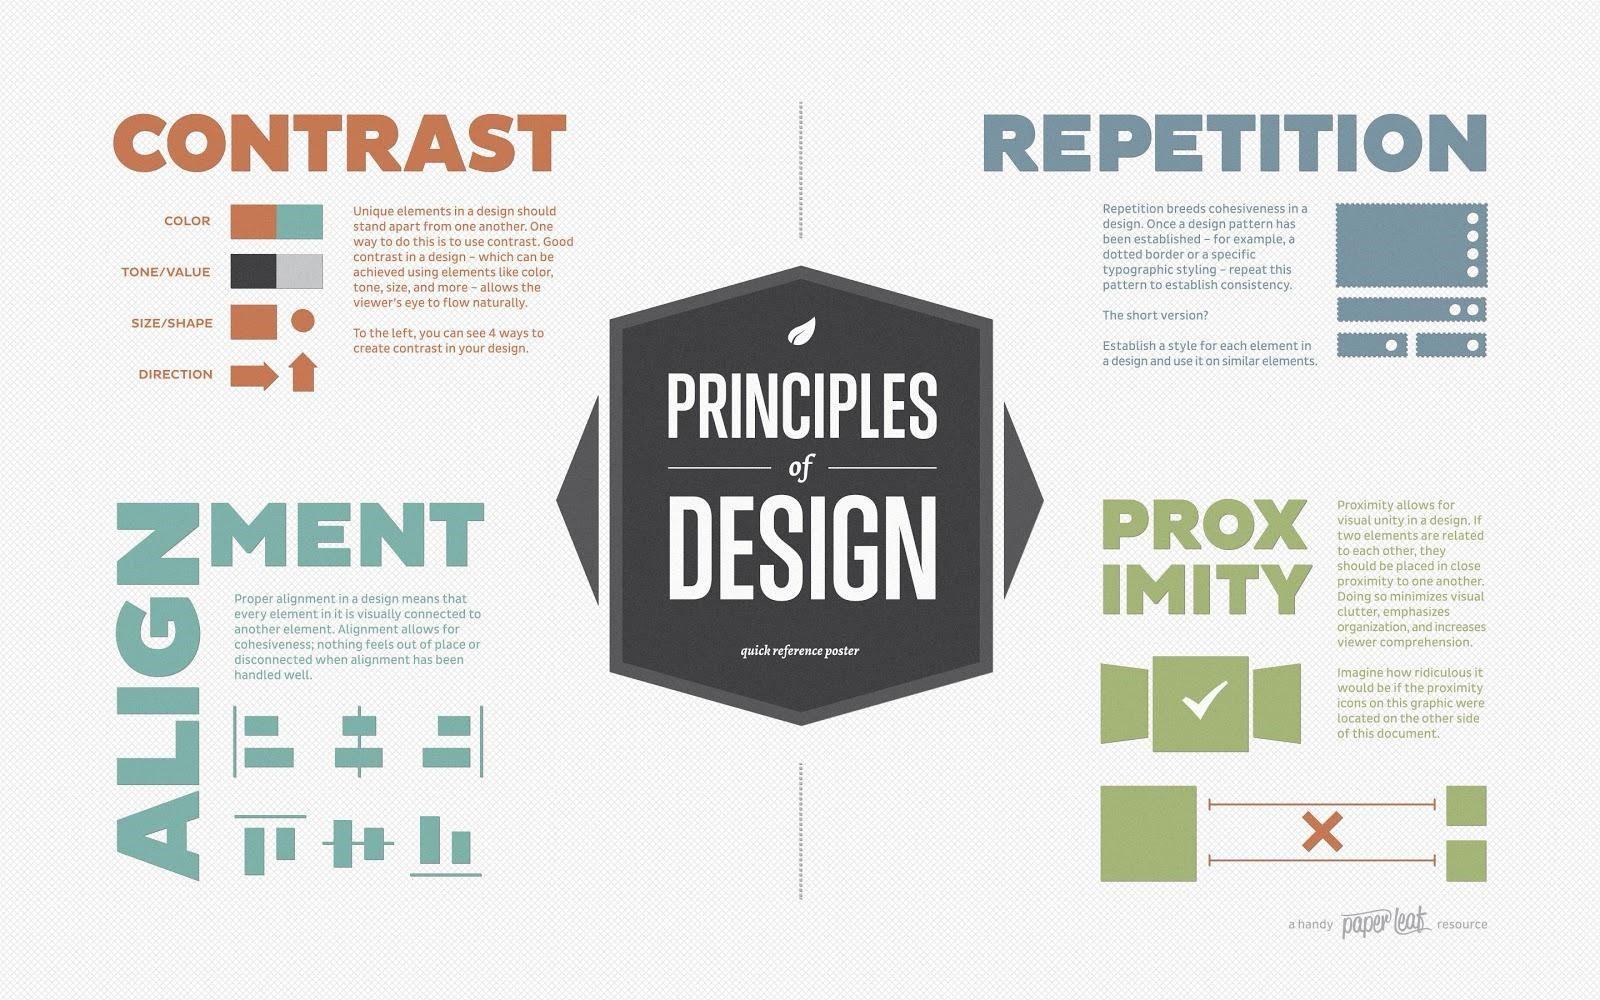 Capability Statement Principles of Design